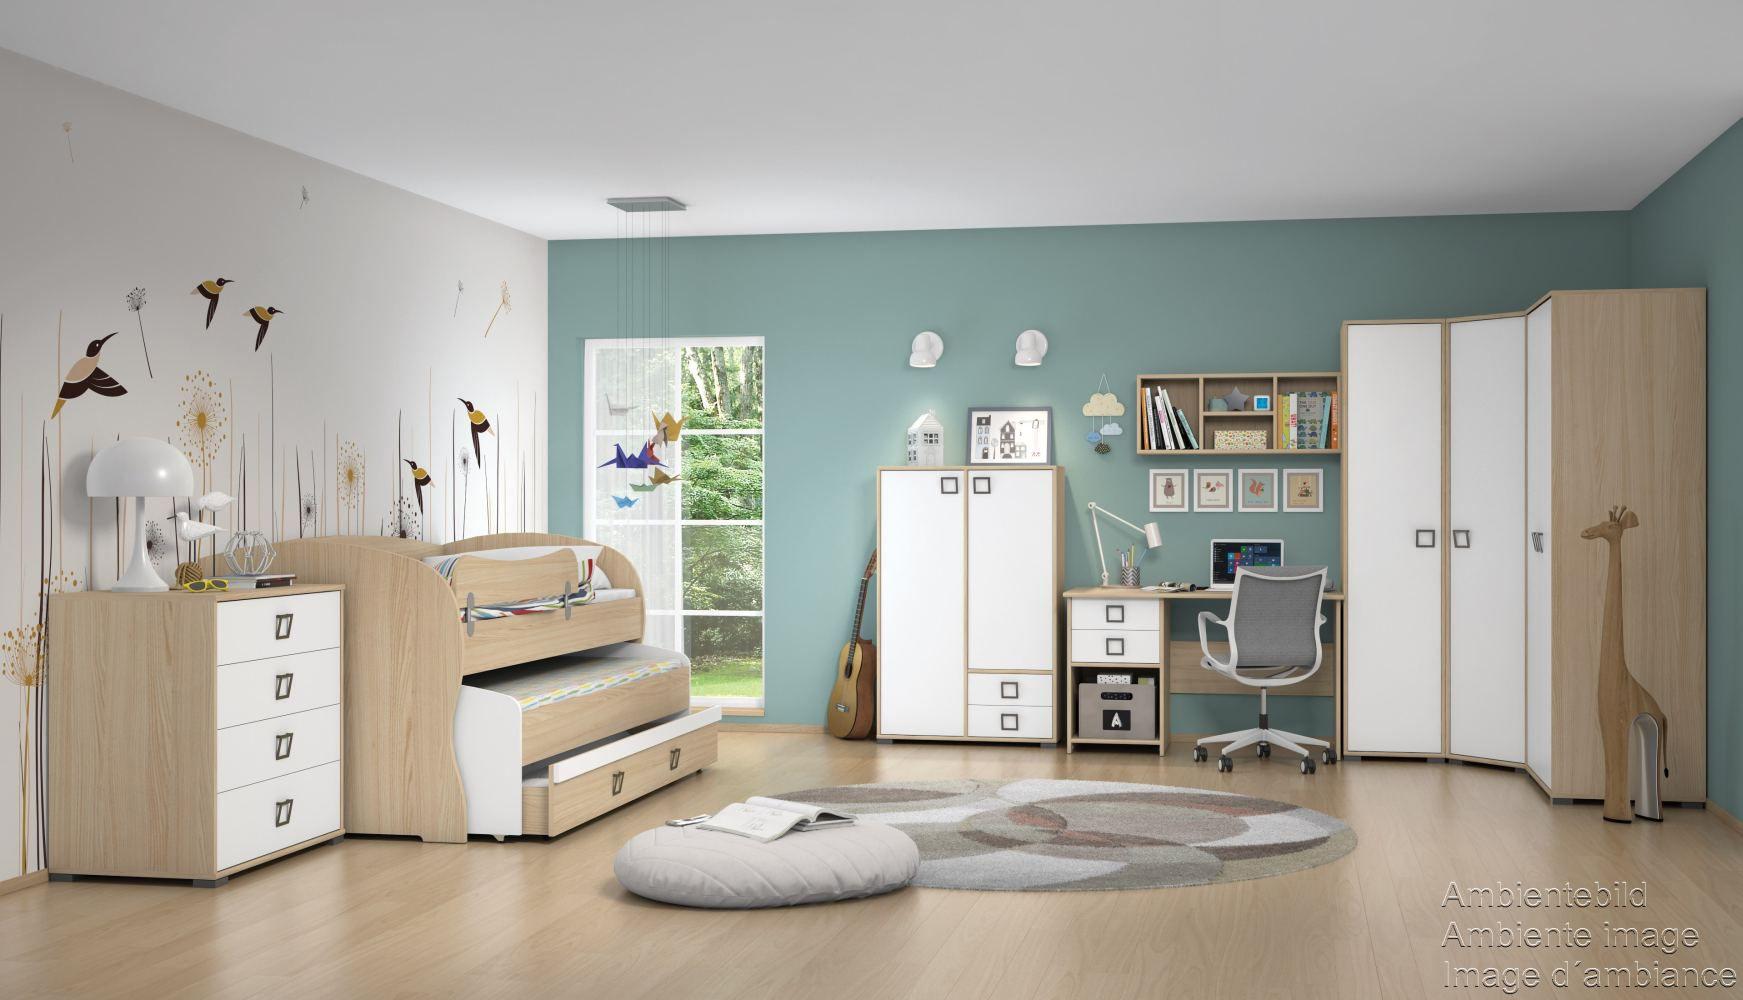 Full Size of Eckschrank Eckkleiderschrank Kinderzimmer Esche 236x86x86 Cm Regal Regale Weiß Sofa Kinderzimmer Eckkleiderschrank Kinderzimmer